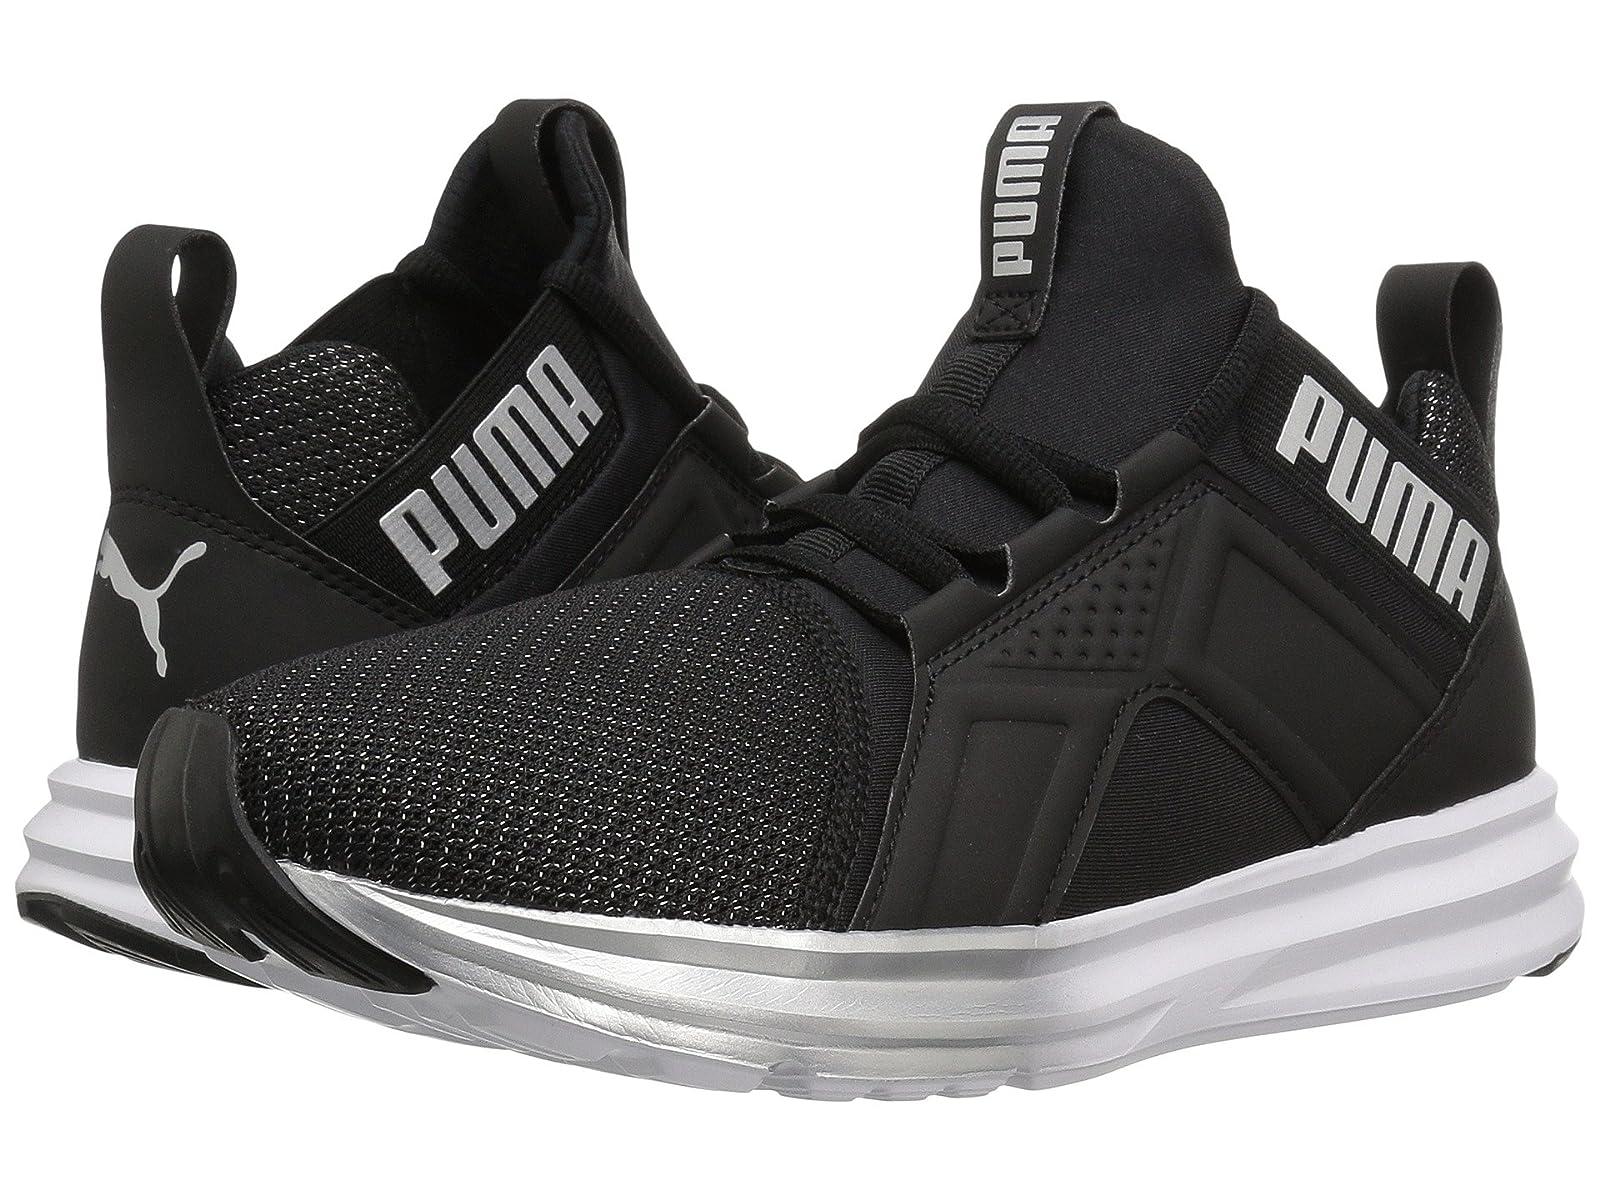 PUMA Enzo MetallicCheap and distinctive eye-catching shoes